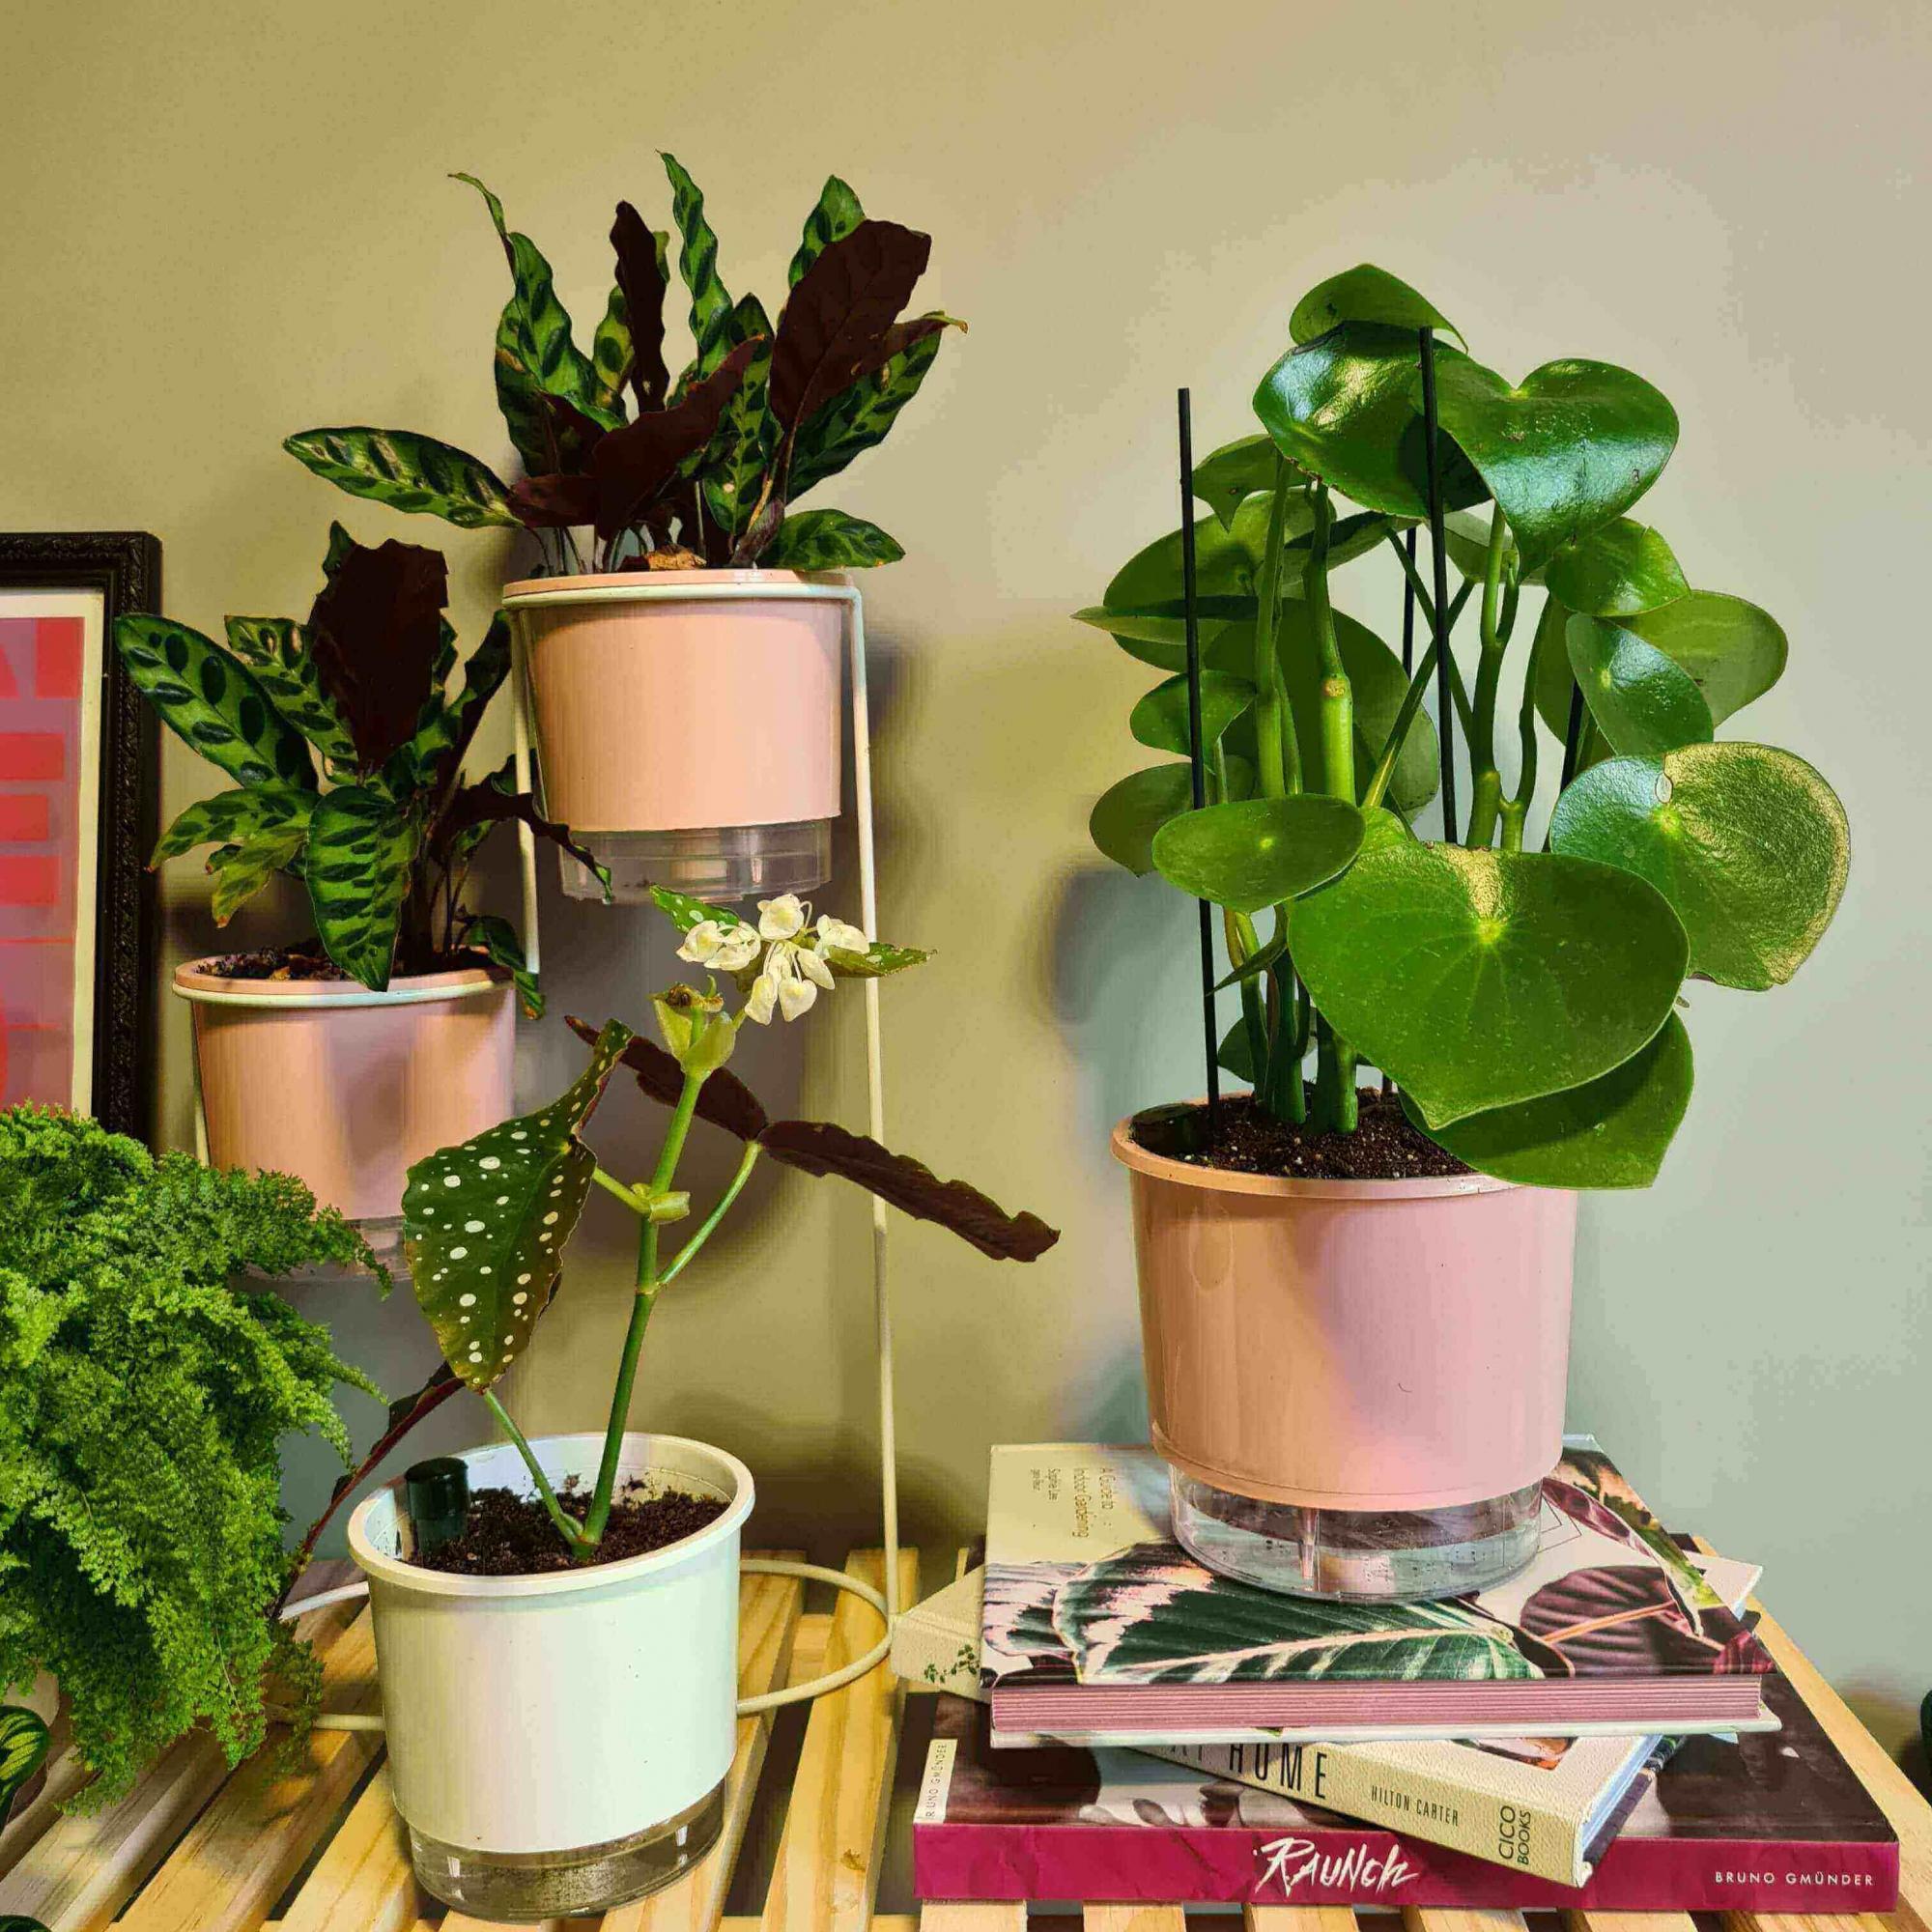 Conjunto plant gang nas quartas usamos rosa  - Loja Raiz